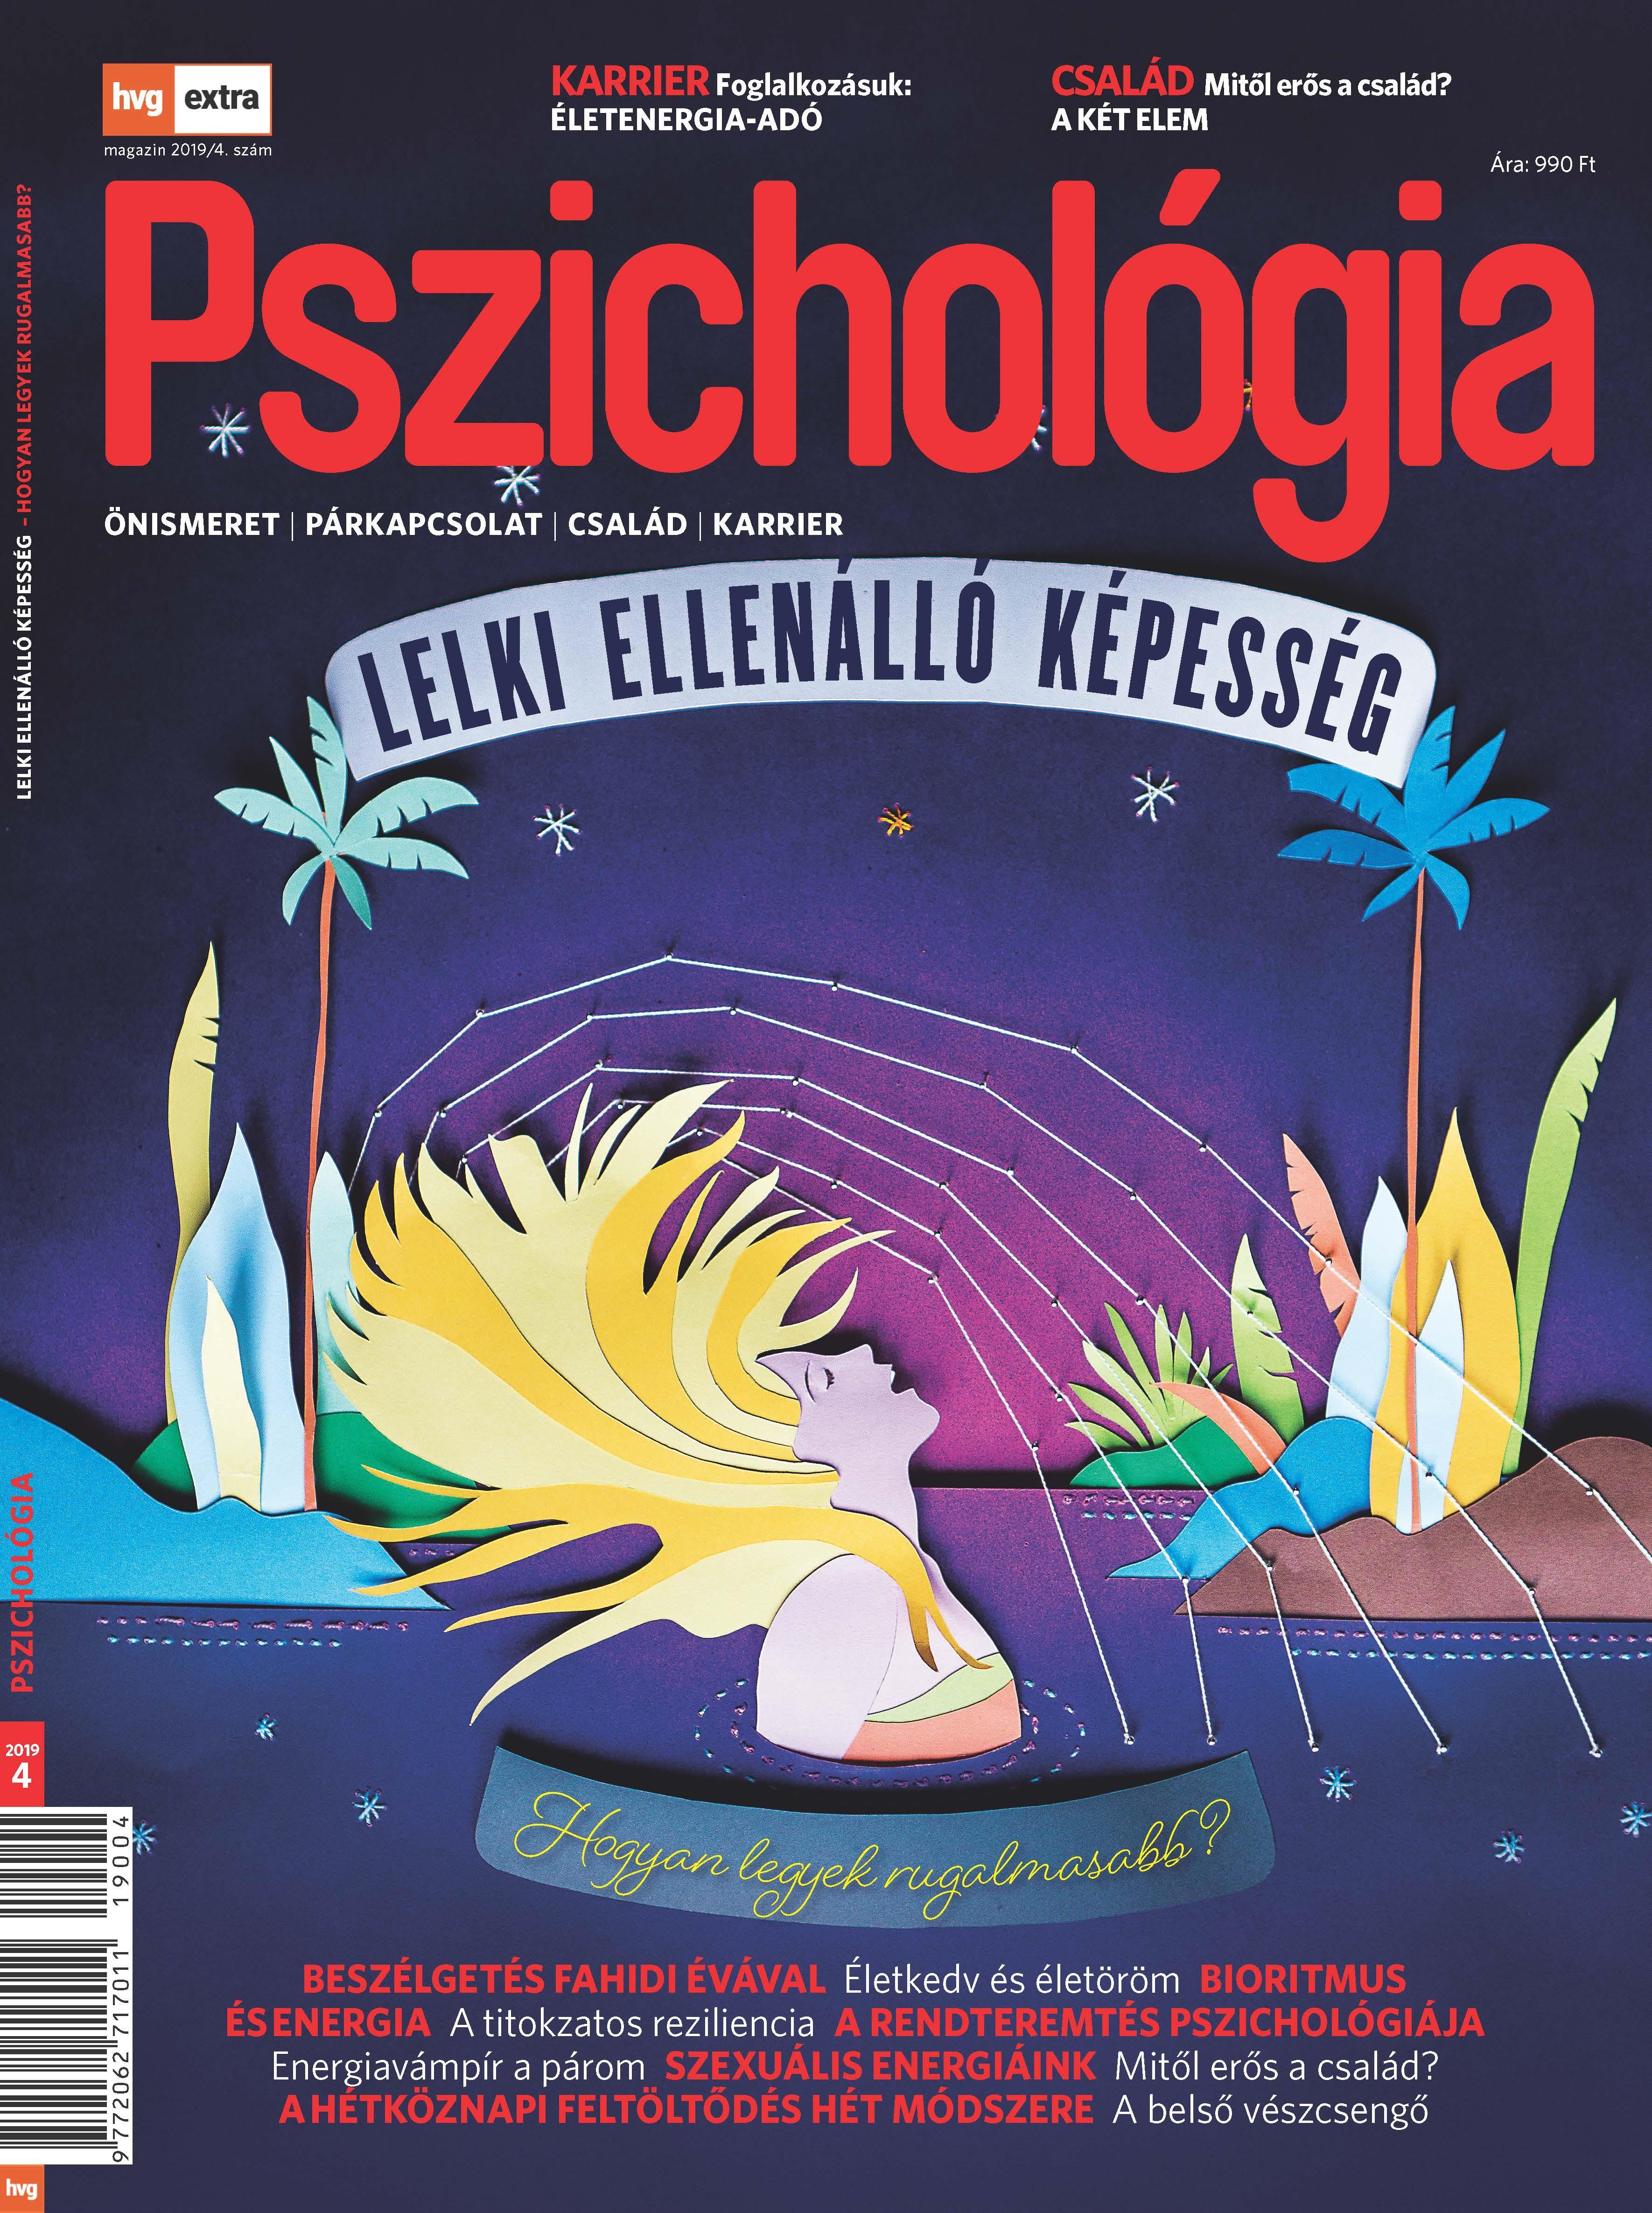 HVG Extra Magazin - Pszichológia 2019/04 -  pdf epub